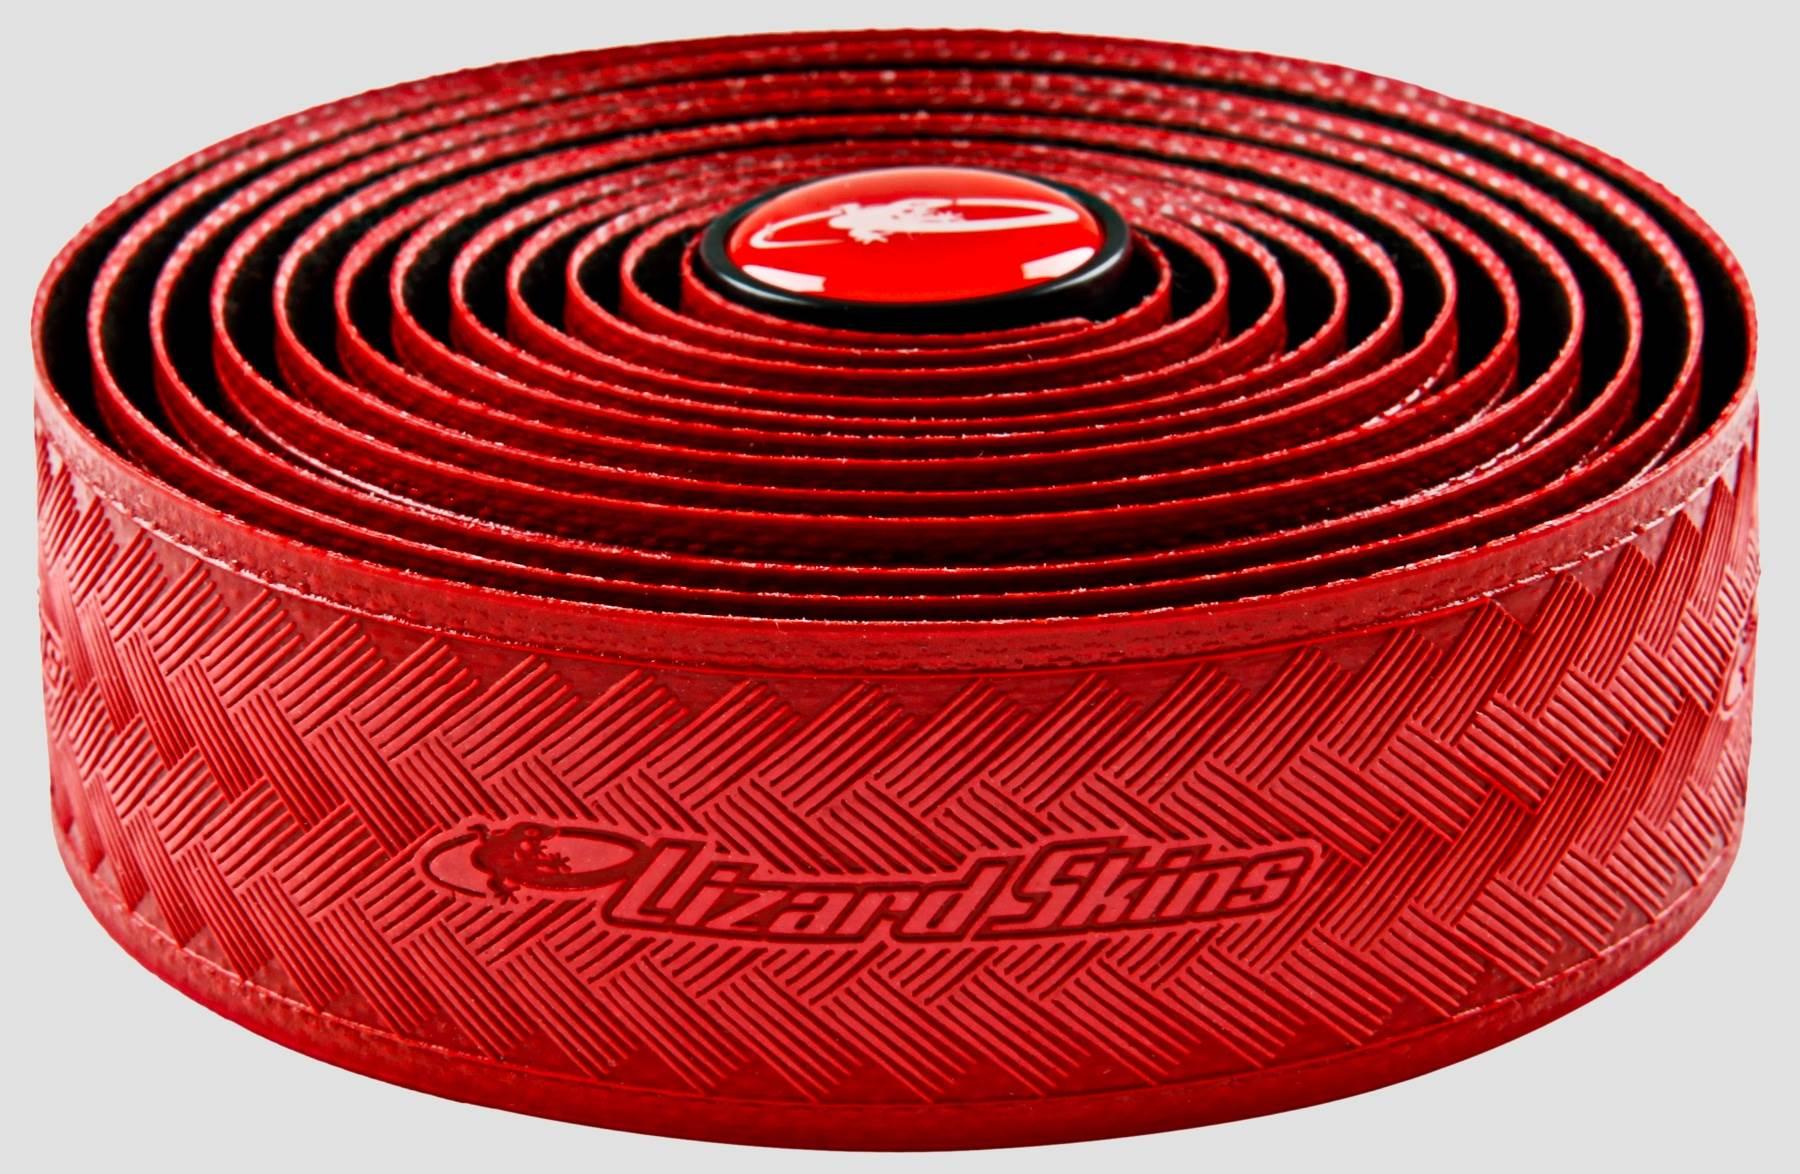 FITA DE GUIDÃO LIZARD SKINS DSPDST50 - RED 3.2MM